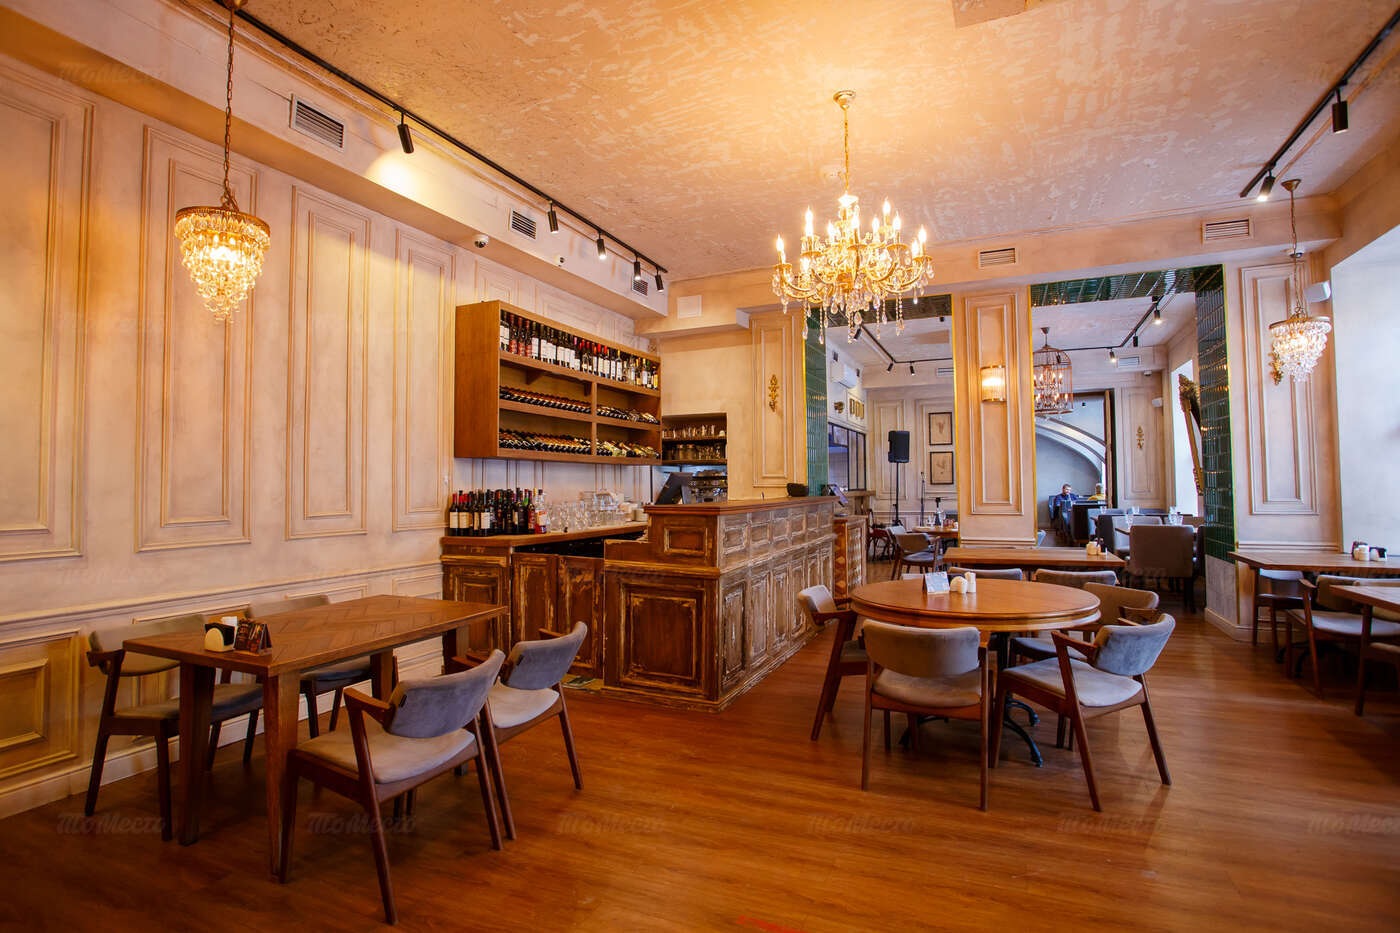 Ресторан Чача на набережной канала Грибоедова фото 16